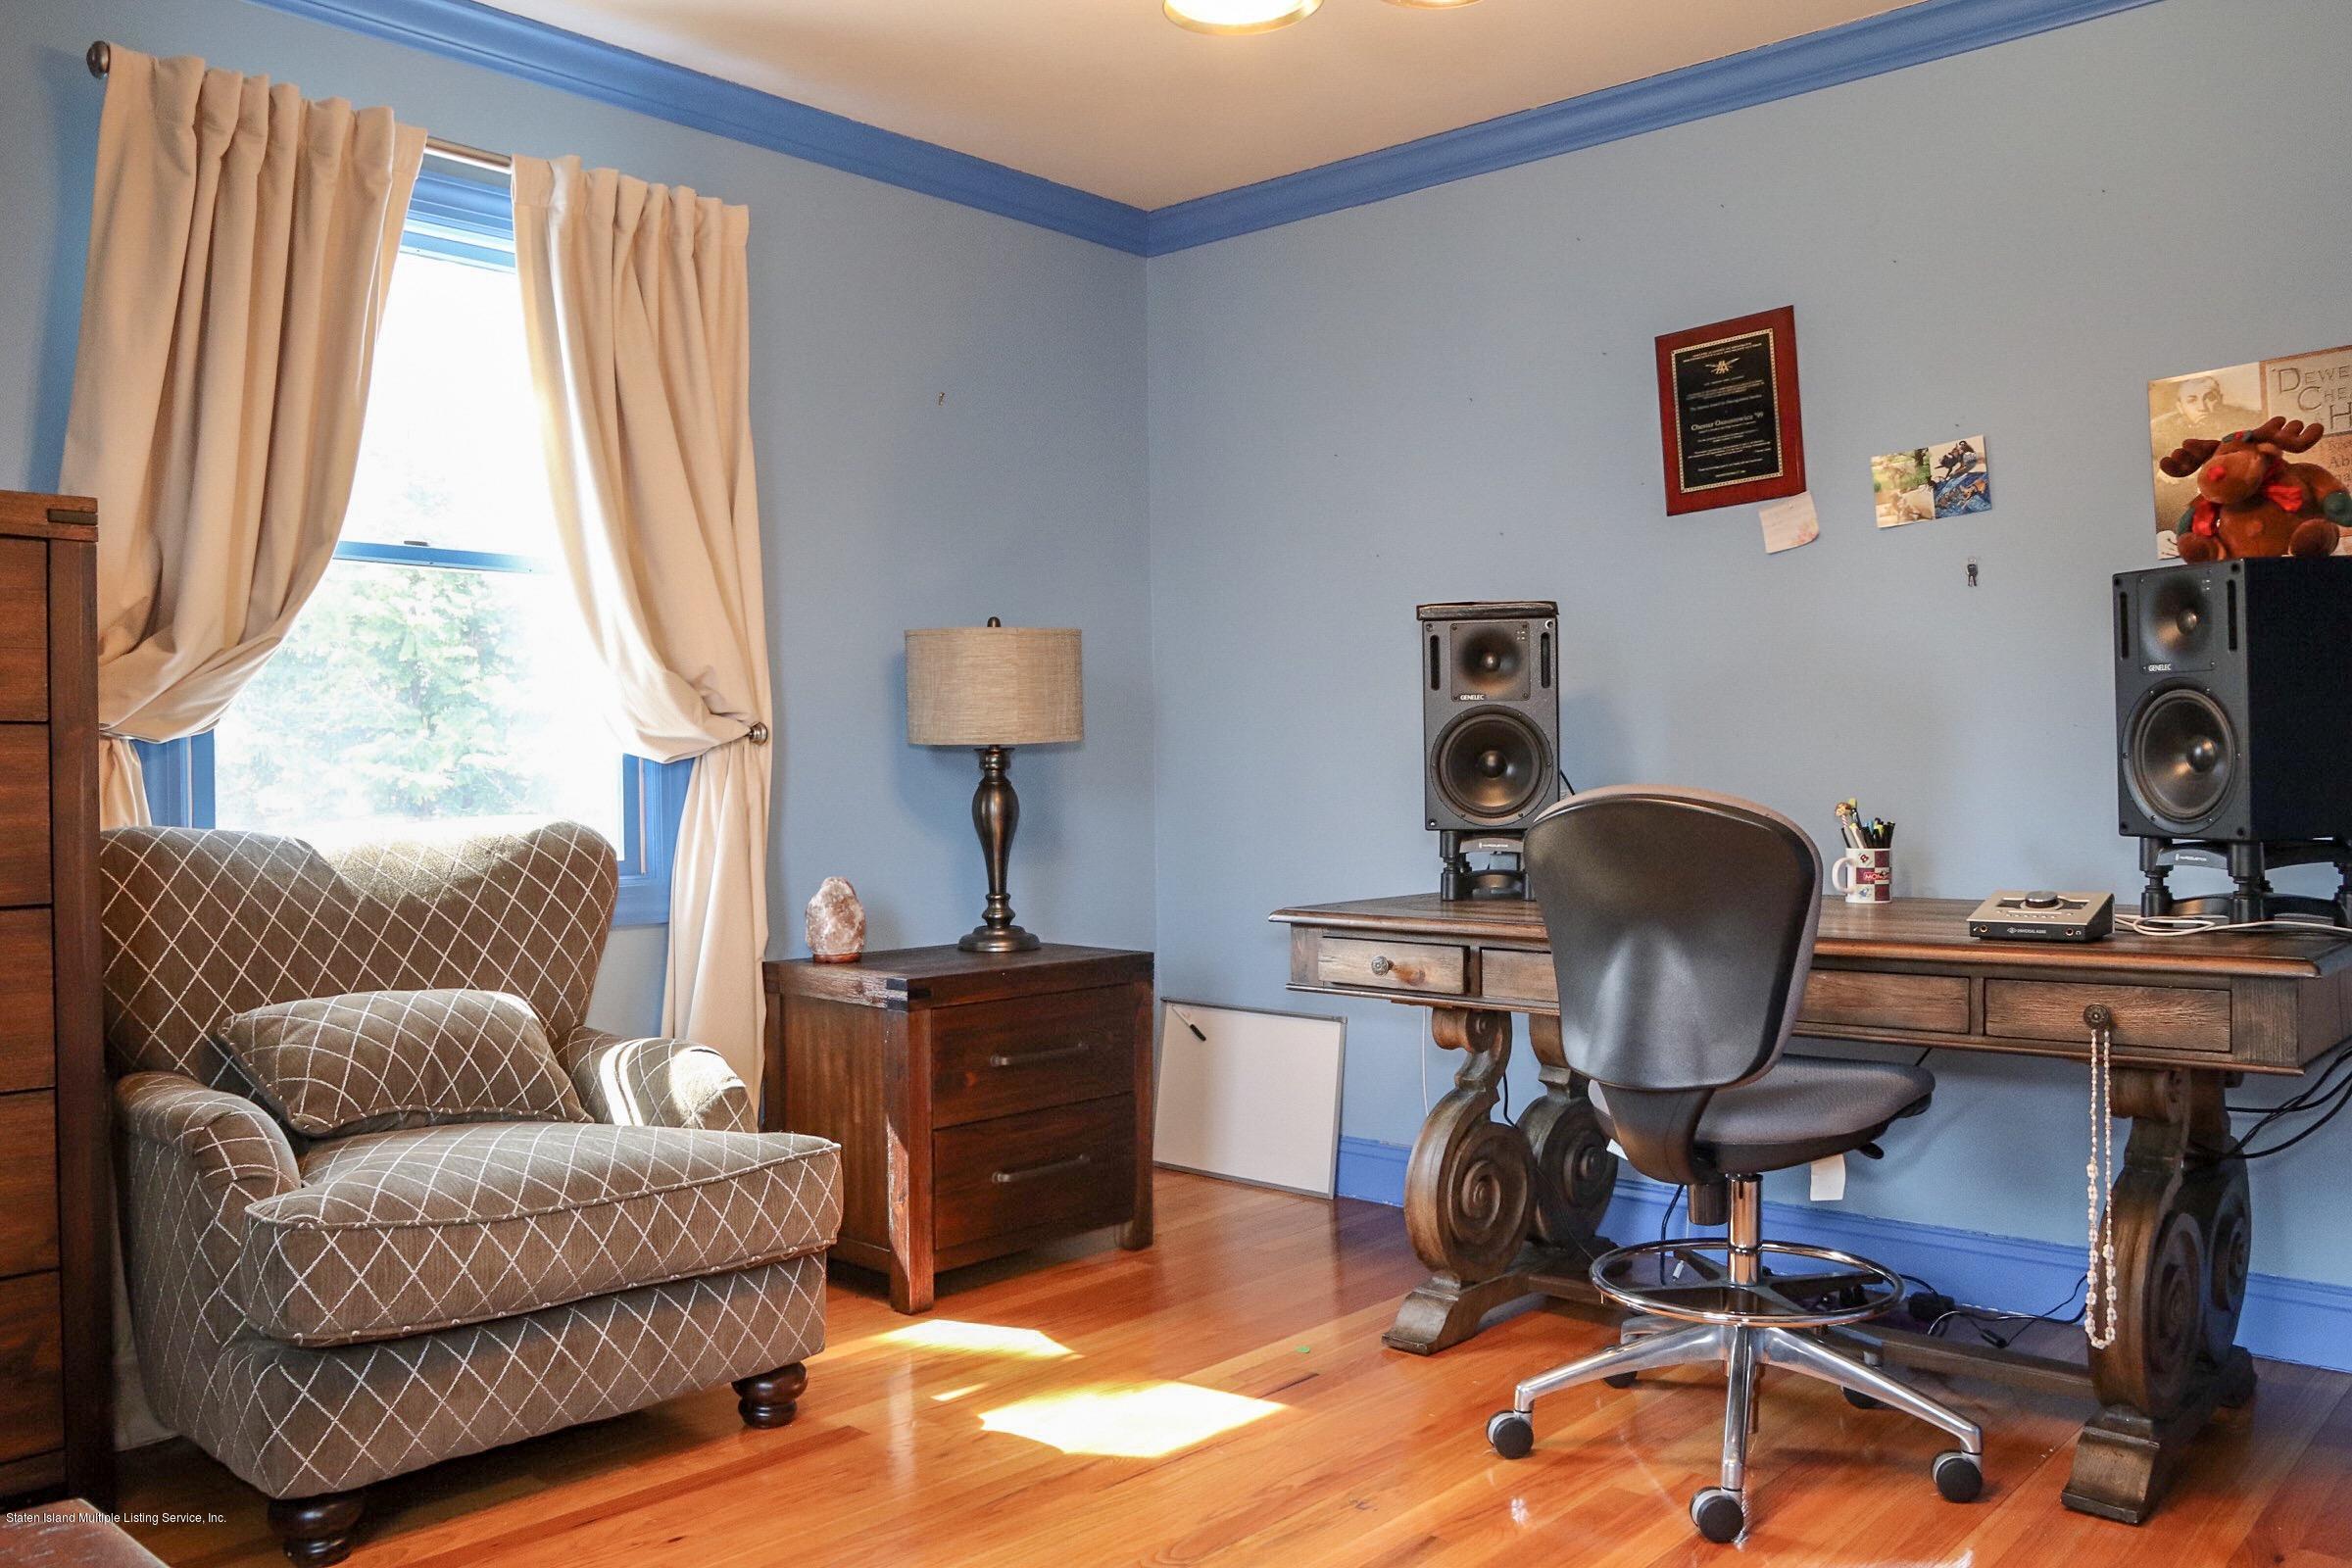 Single Family - Detached 15 Butterworth Avenue  Staten Island, NY 10301, MLS-1127612-4